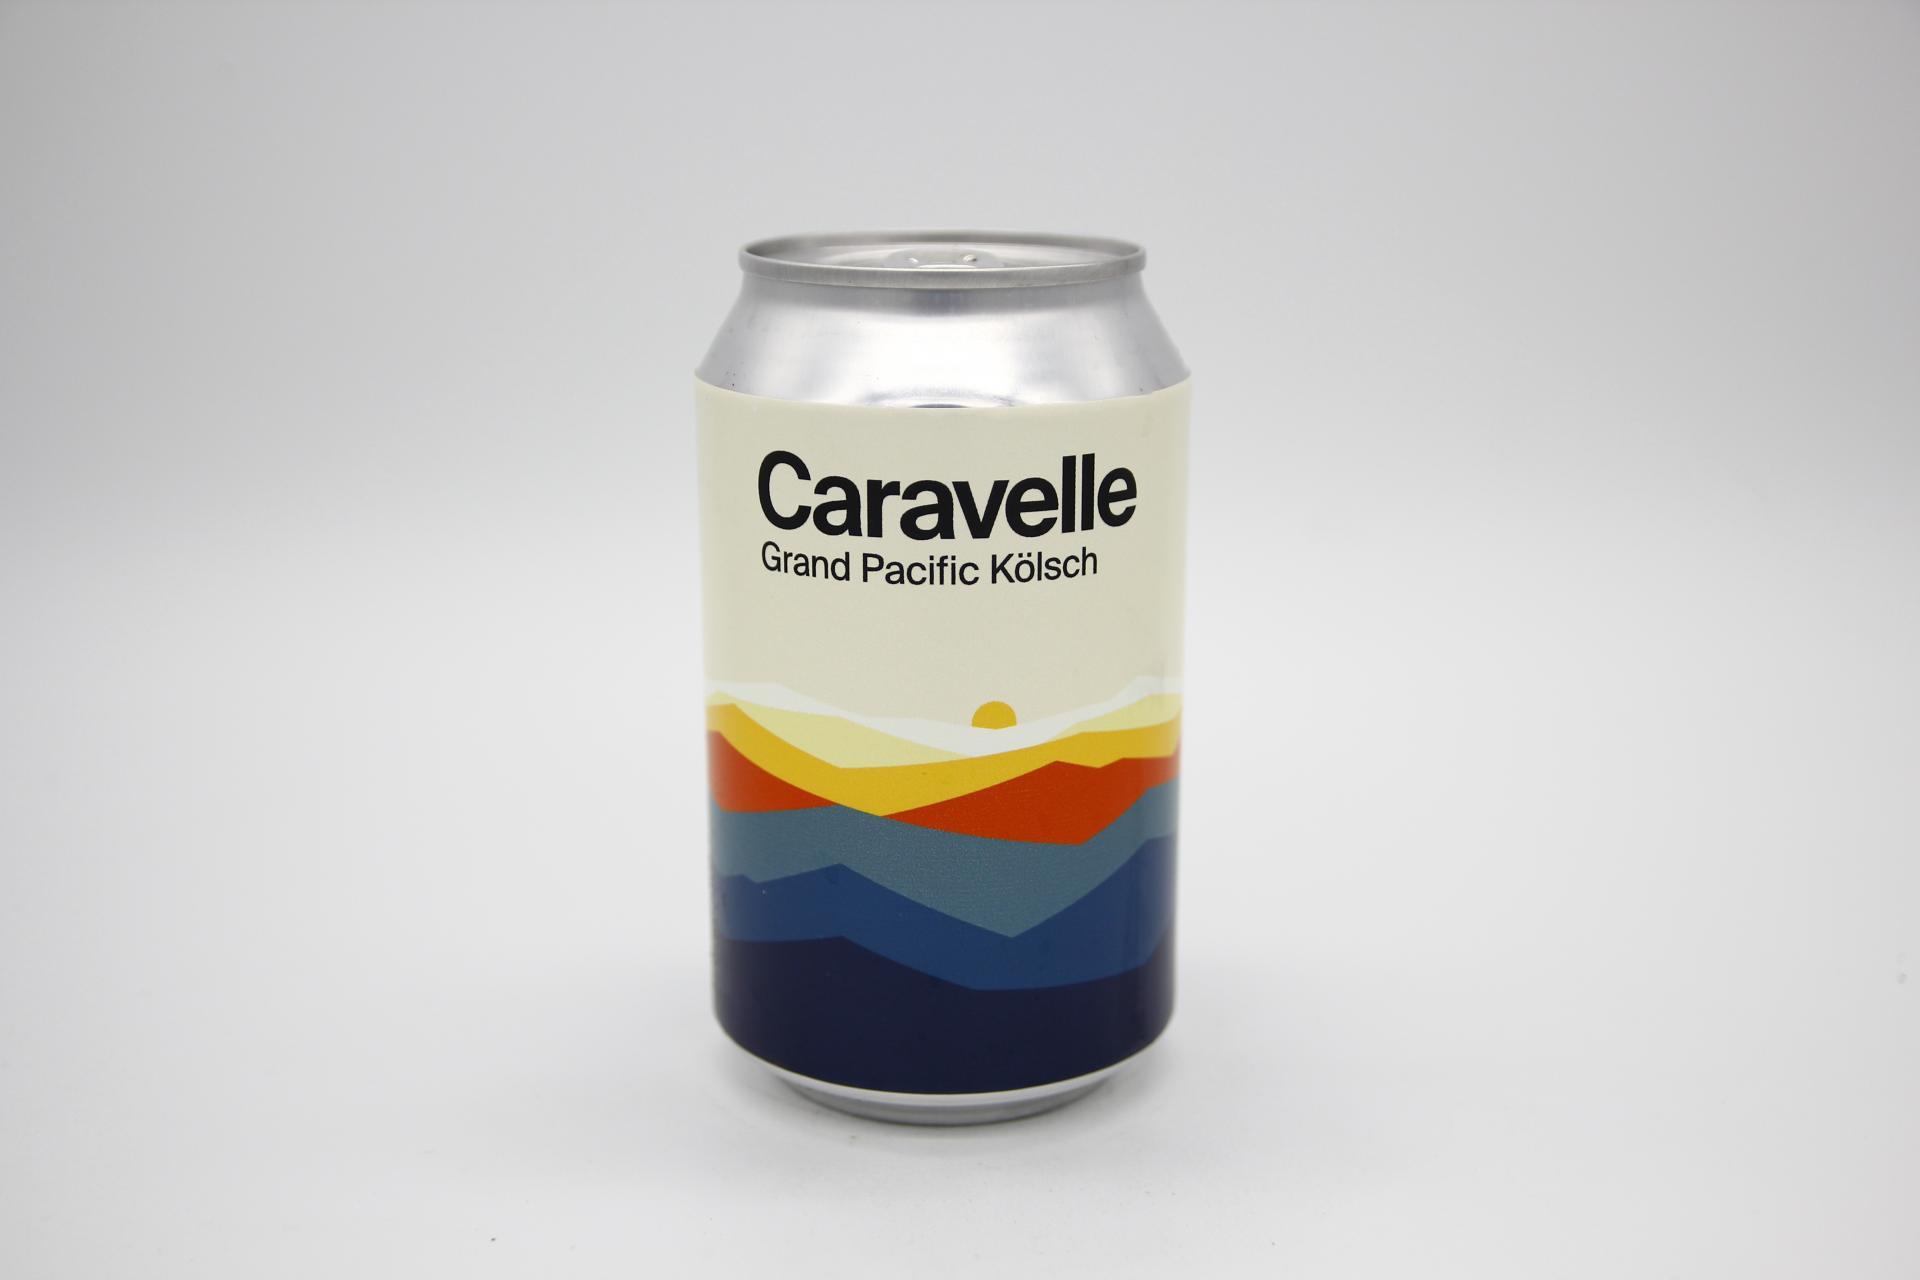 CARAVELLE - GRAND PACIFIC KOLSCH 33cl